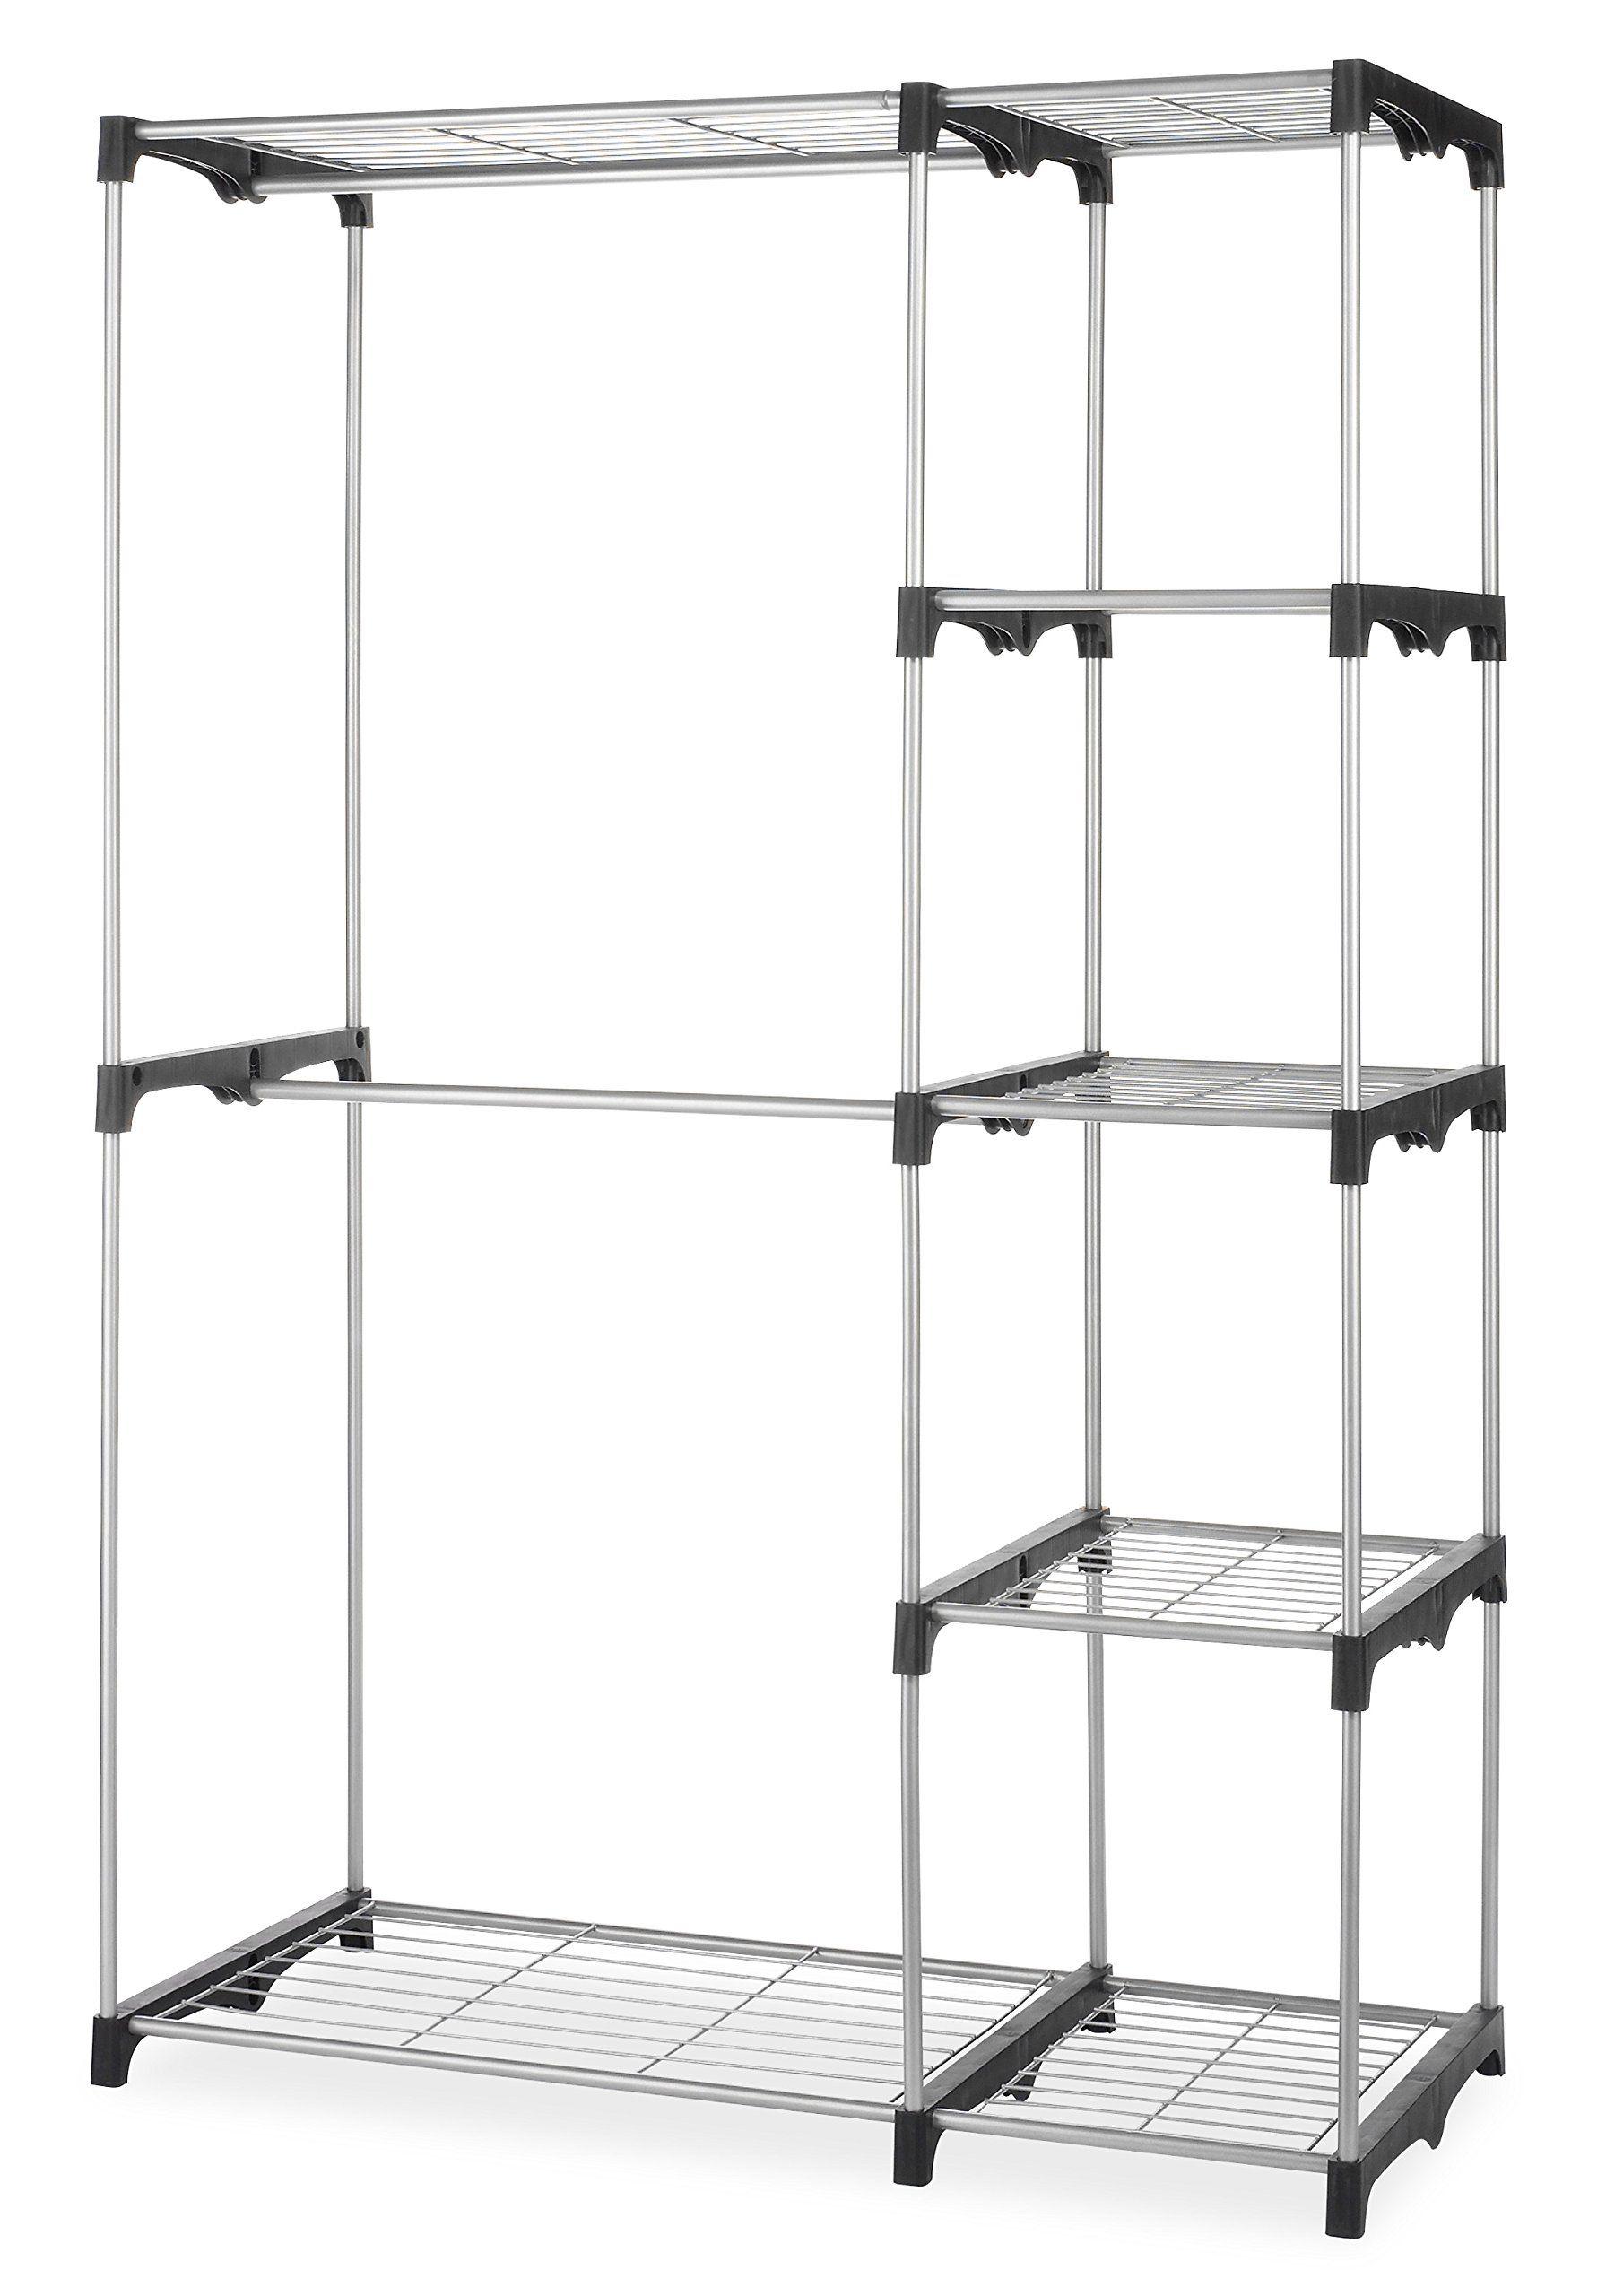 Multi Cube Modular Closet Organizer Stacker Clothes Wardrobe Rack